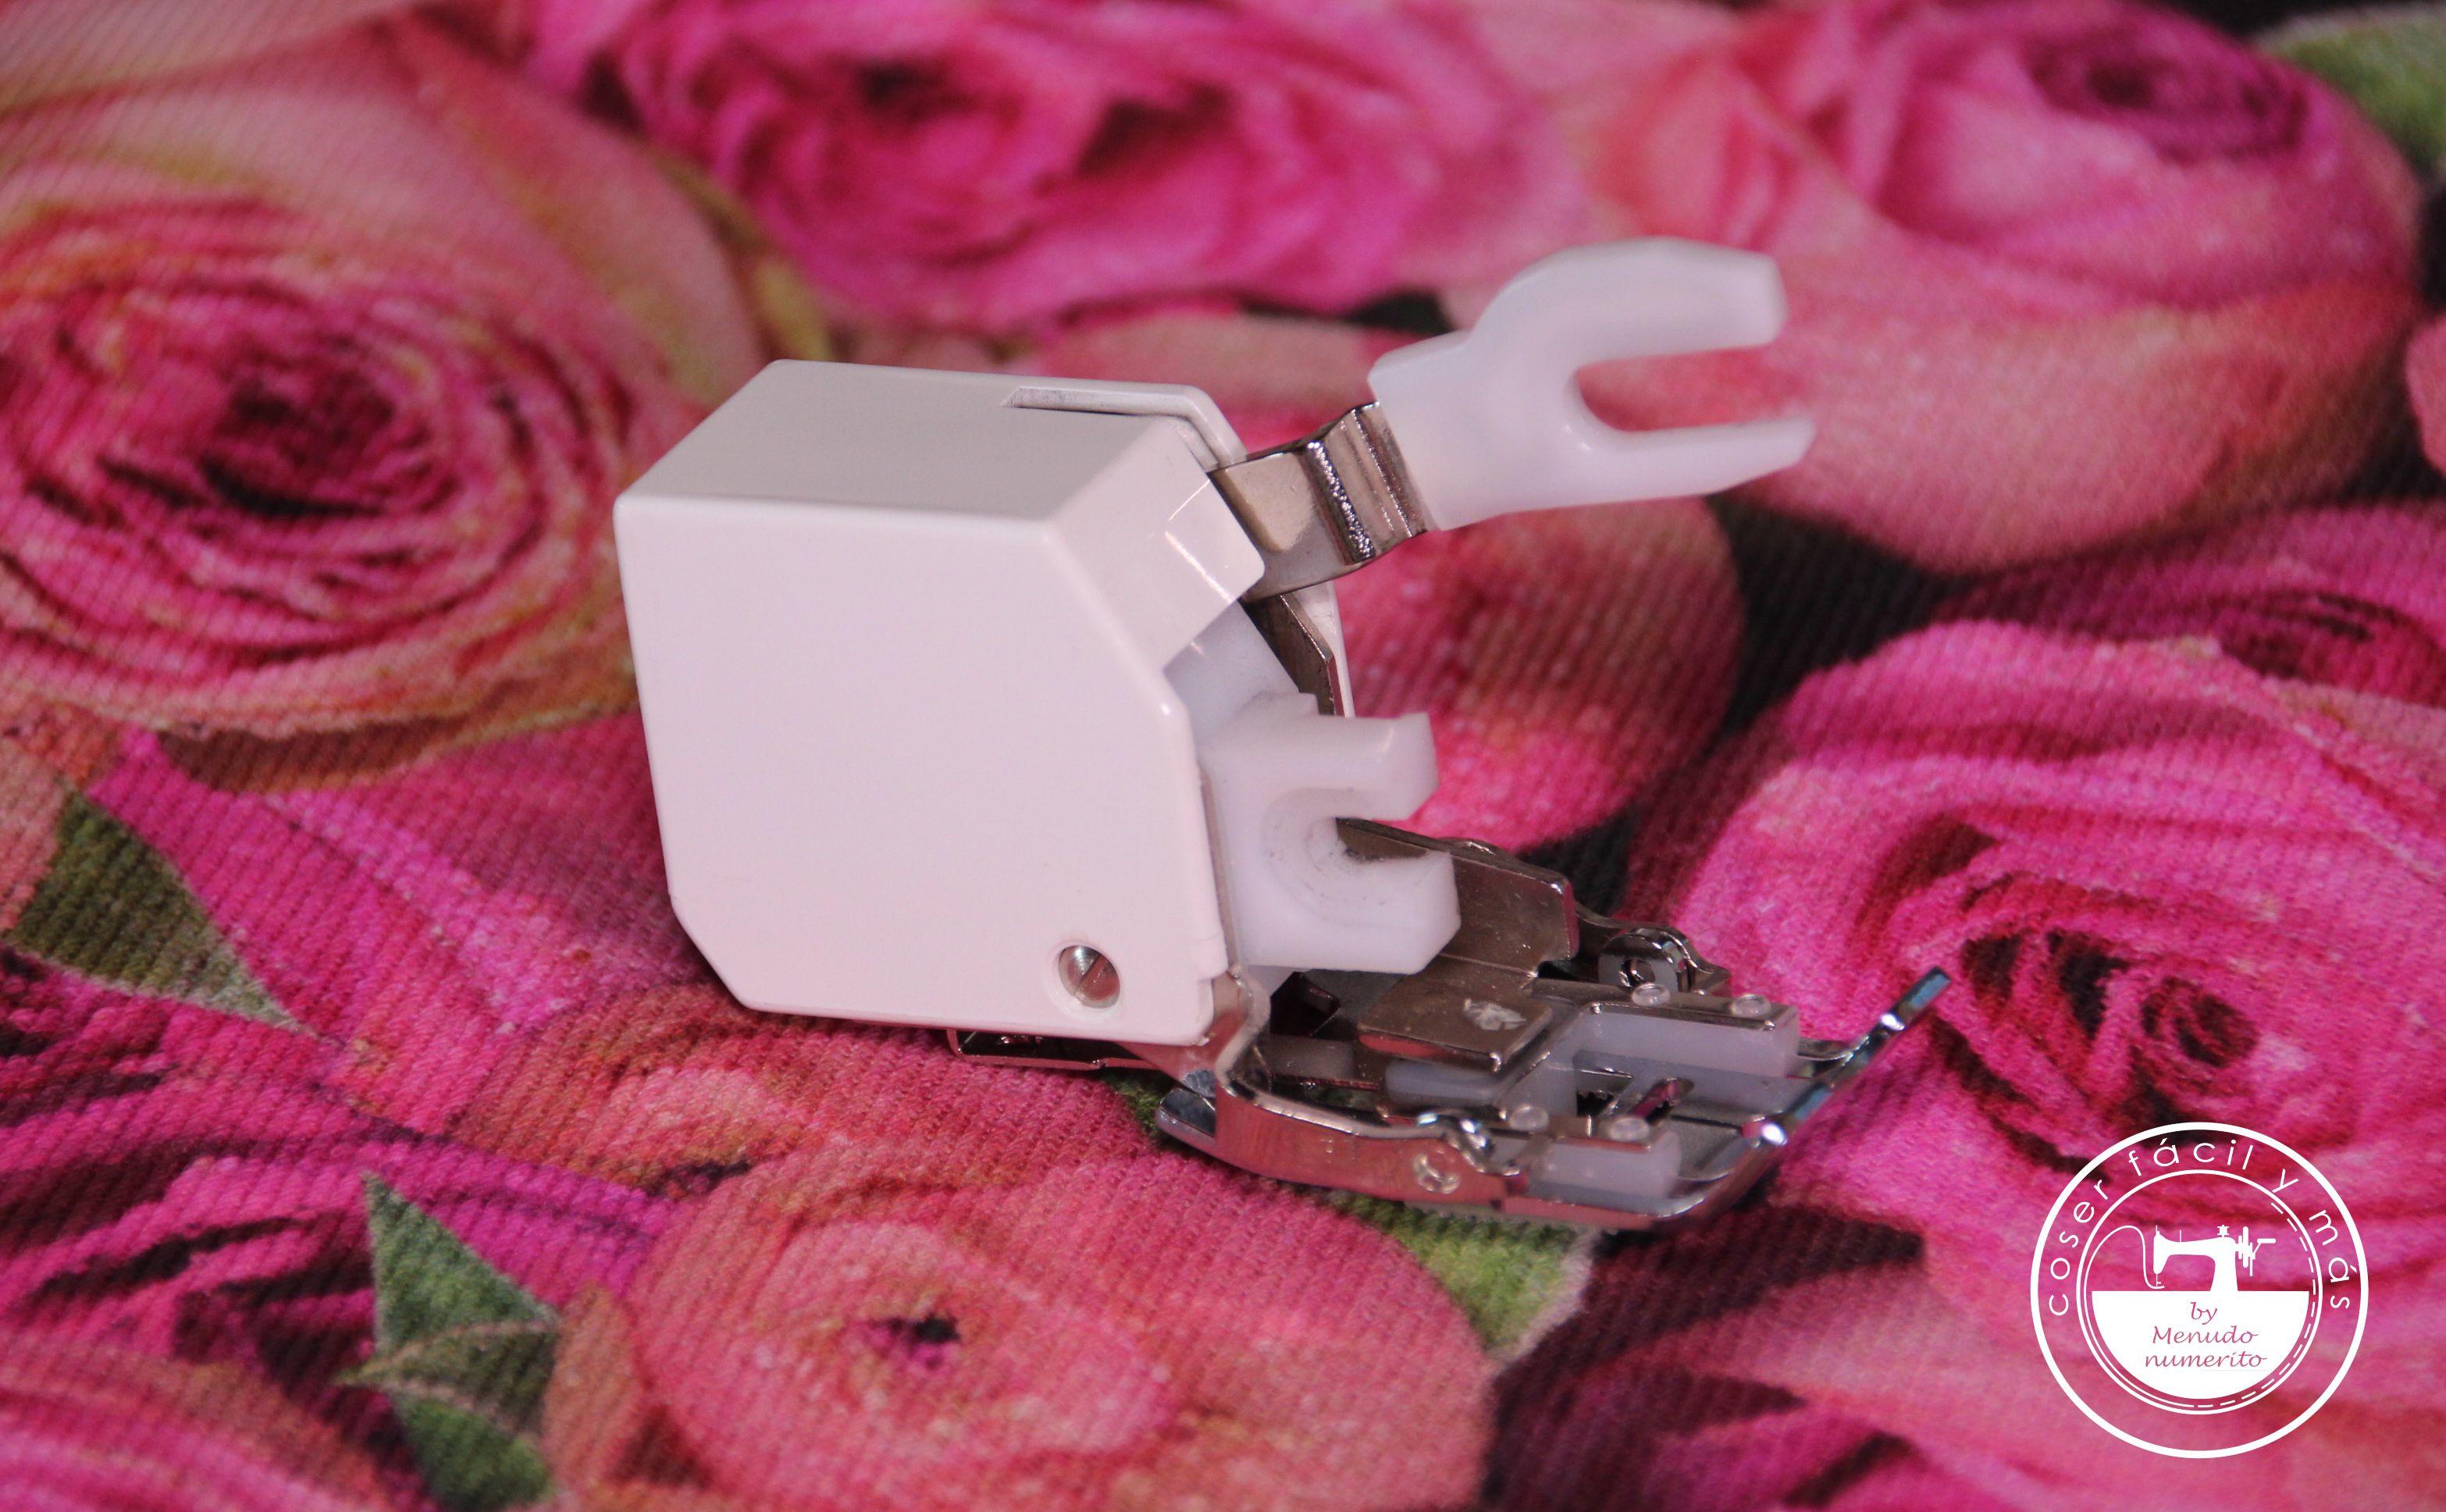 coser telasg ruesas prensatelas doble arrastre blogs de costura